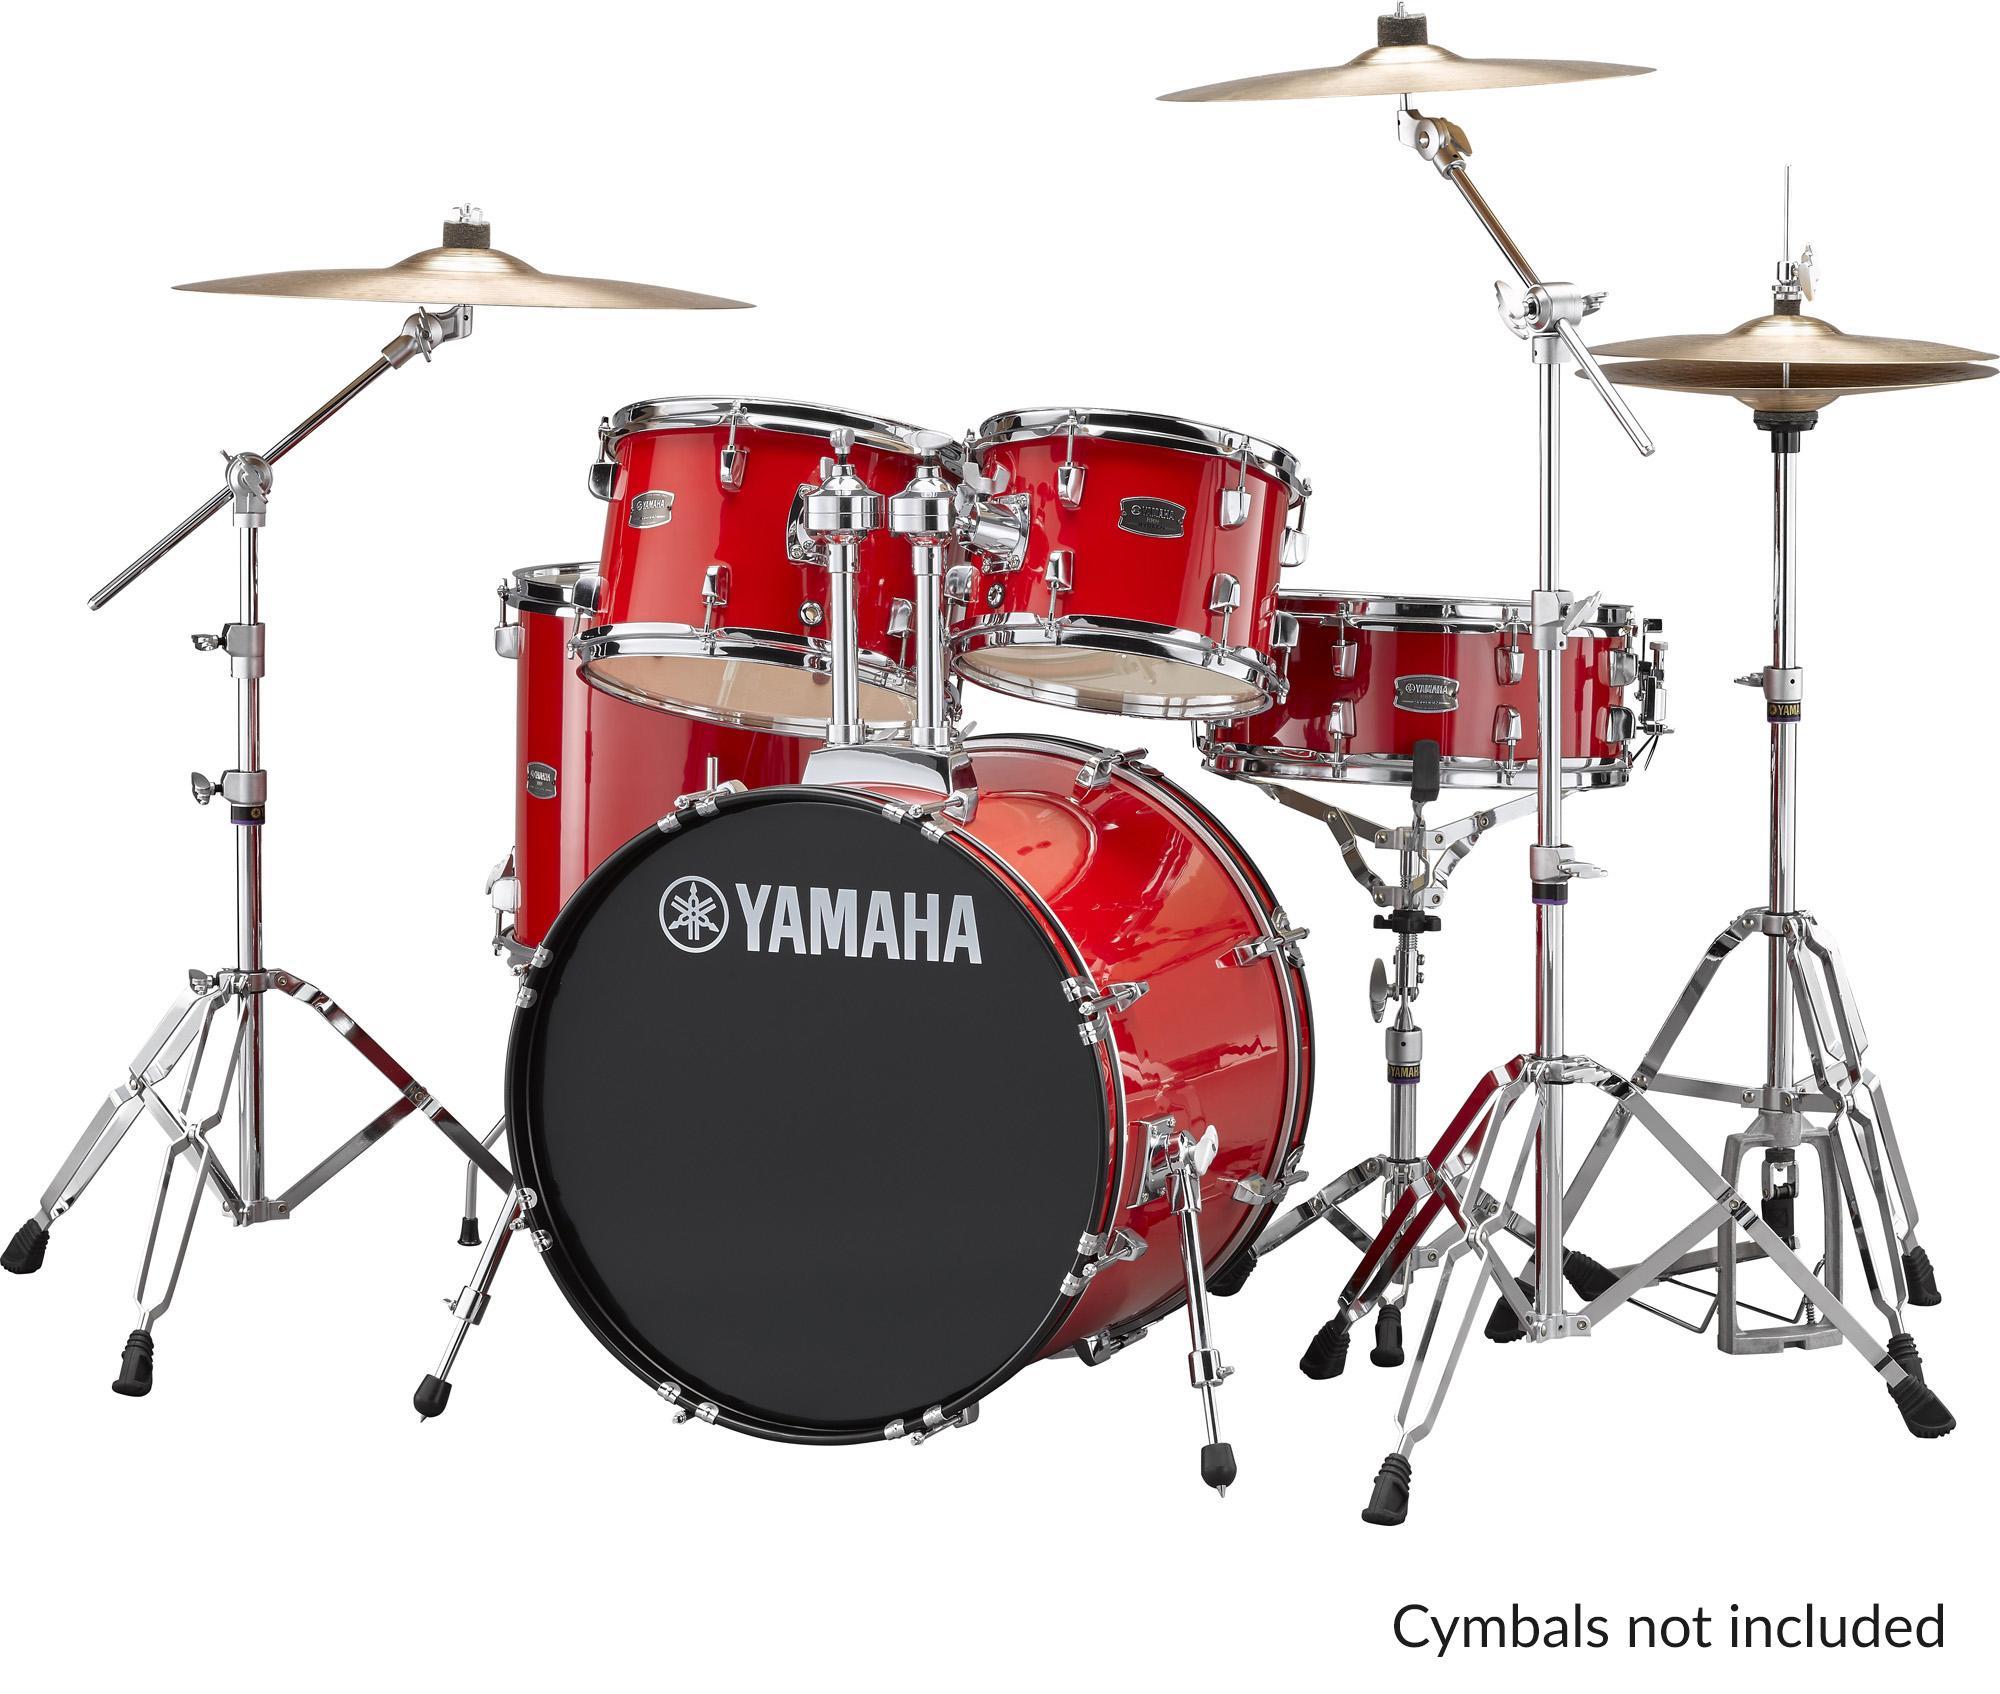 Yamaha Rydeen Drum Shell Kit With Hardware 20 Quot Kick Drum